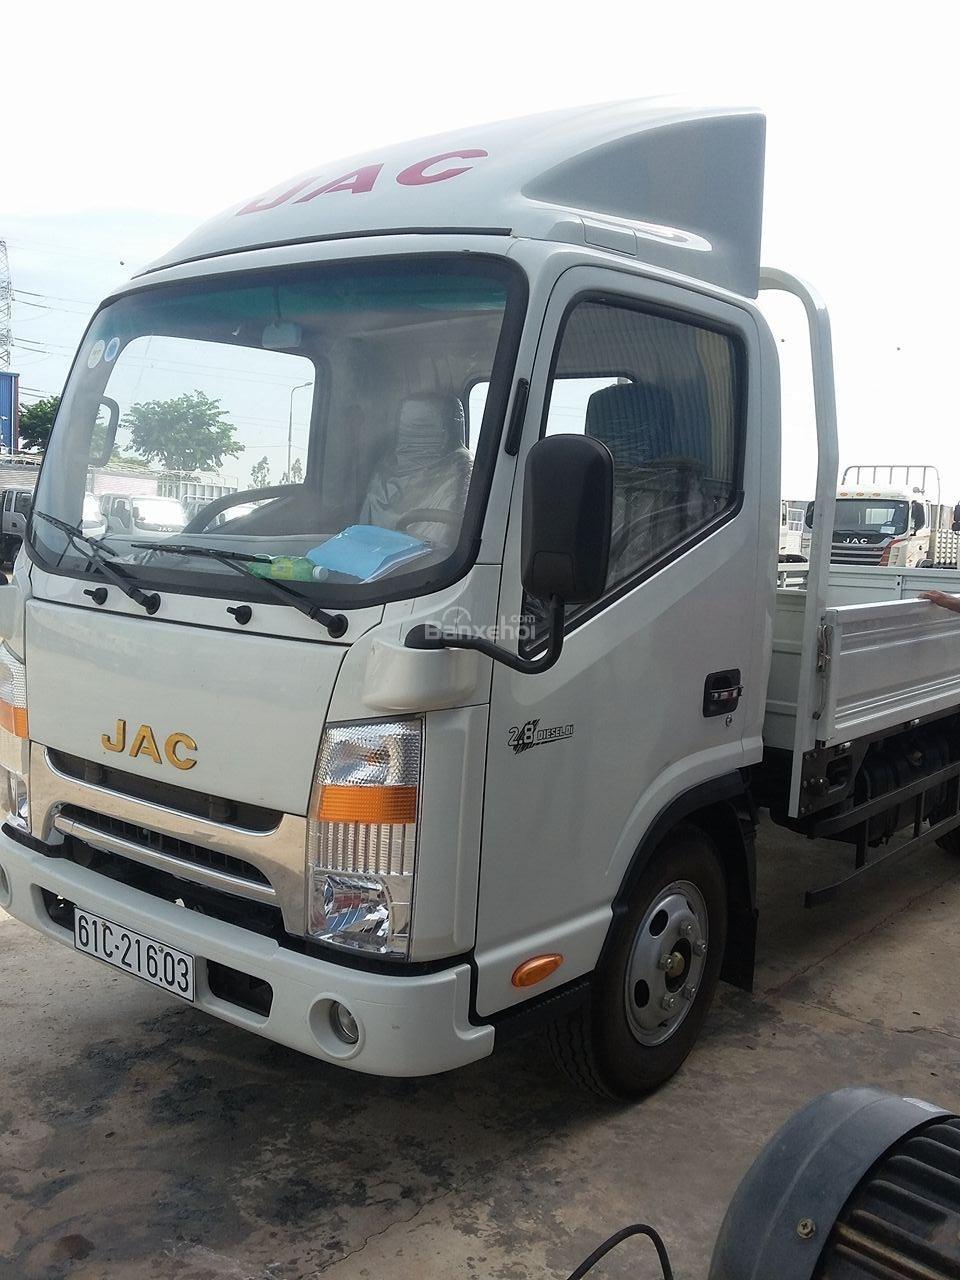 Giá xe tải jac 3T5 máy cn isuzu đầu vuông - Bán xe tải jac 3T5 đầu vuông máy cn isuzu